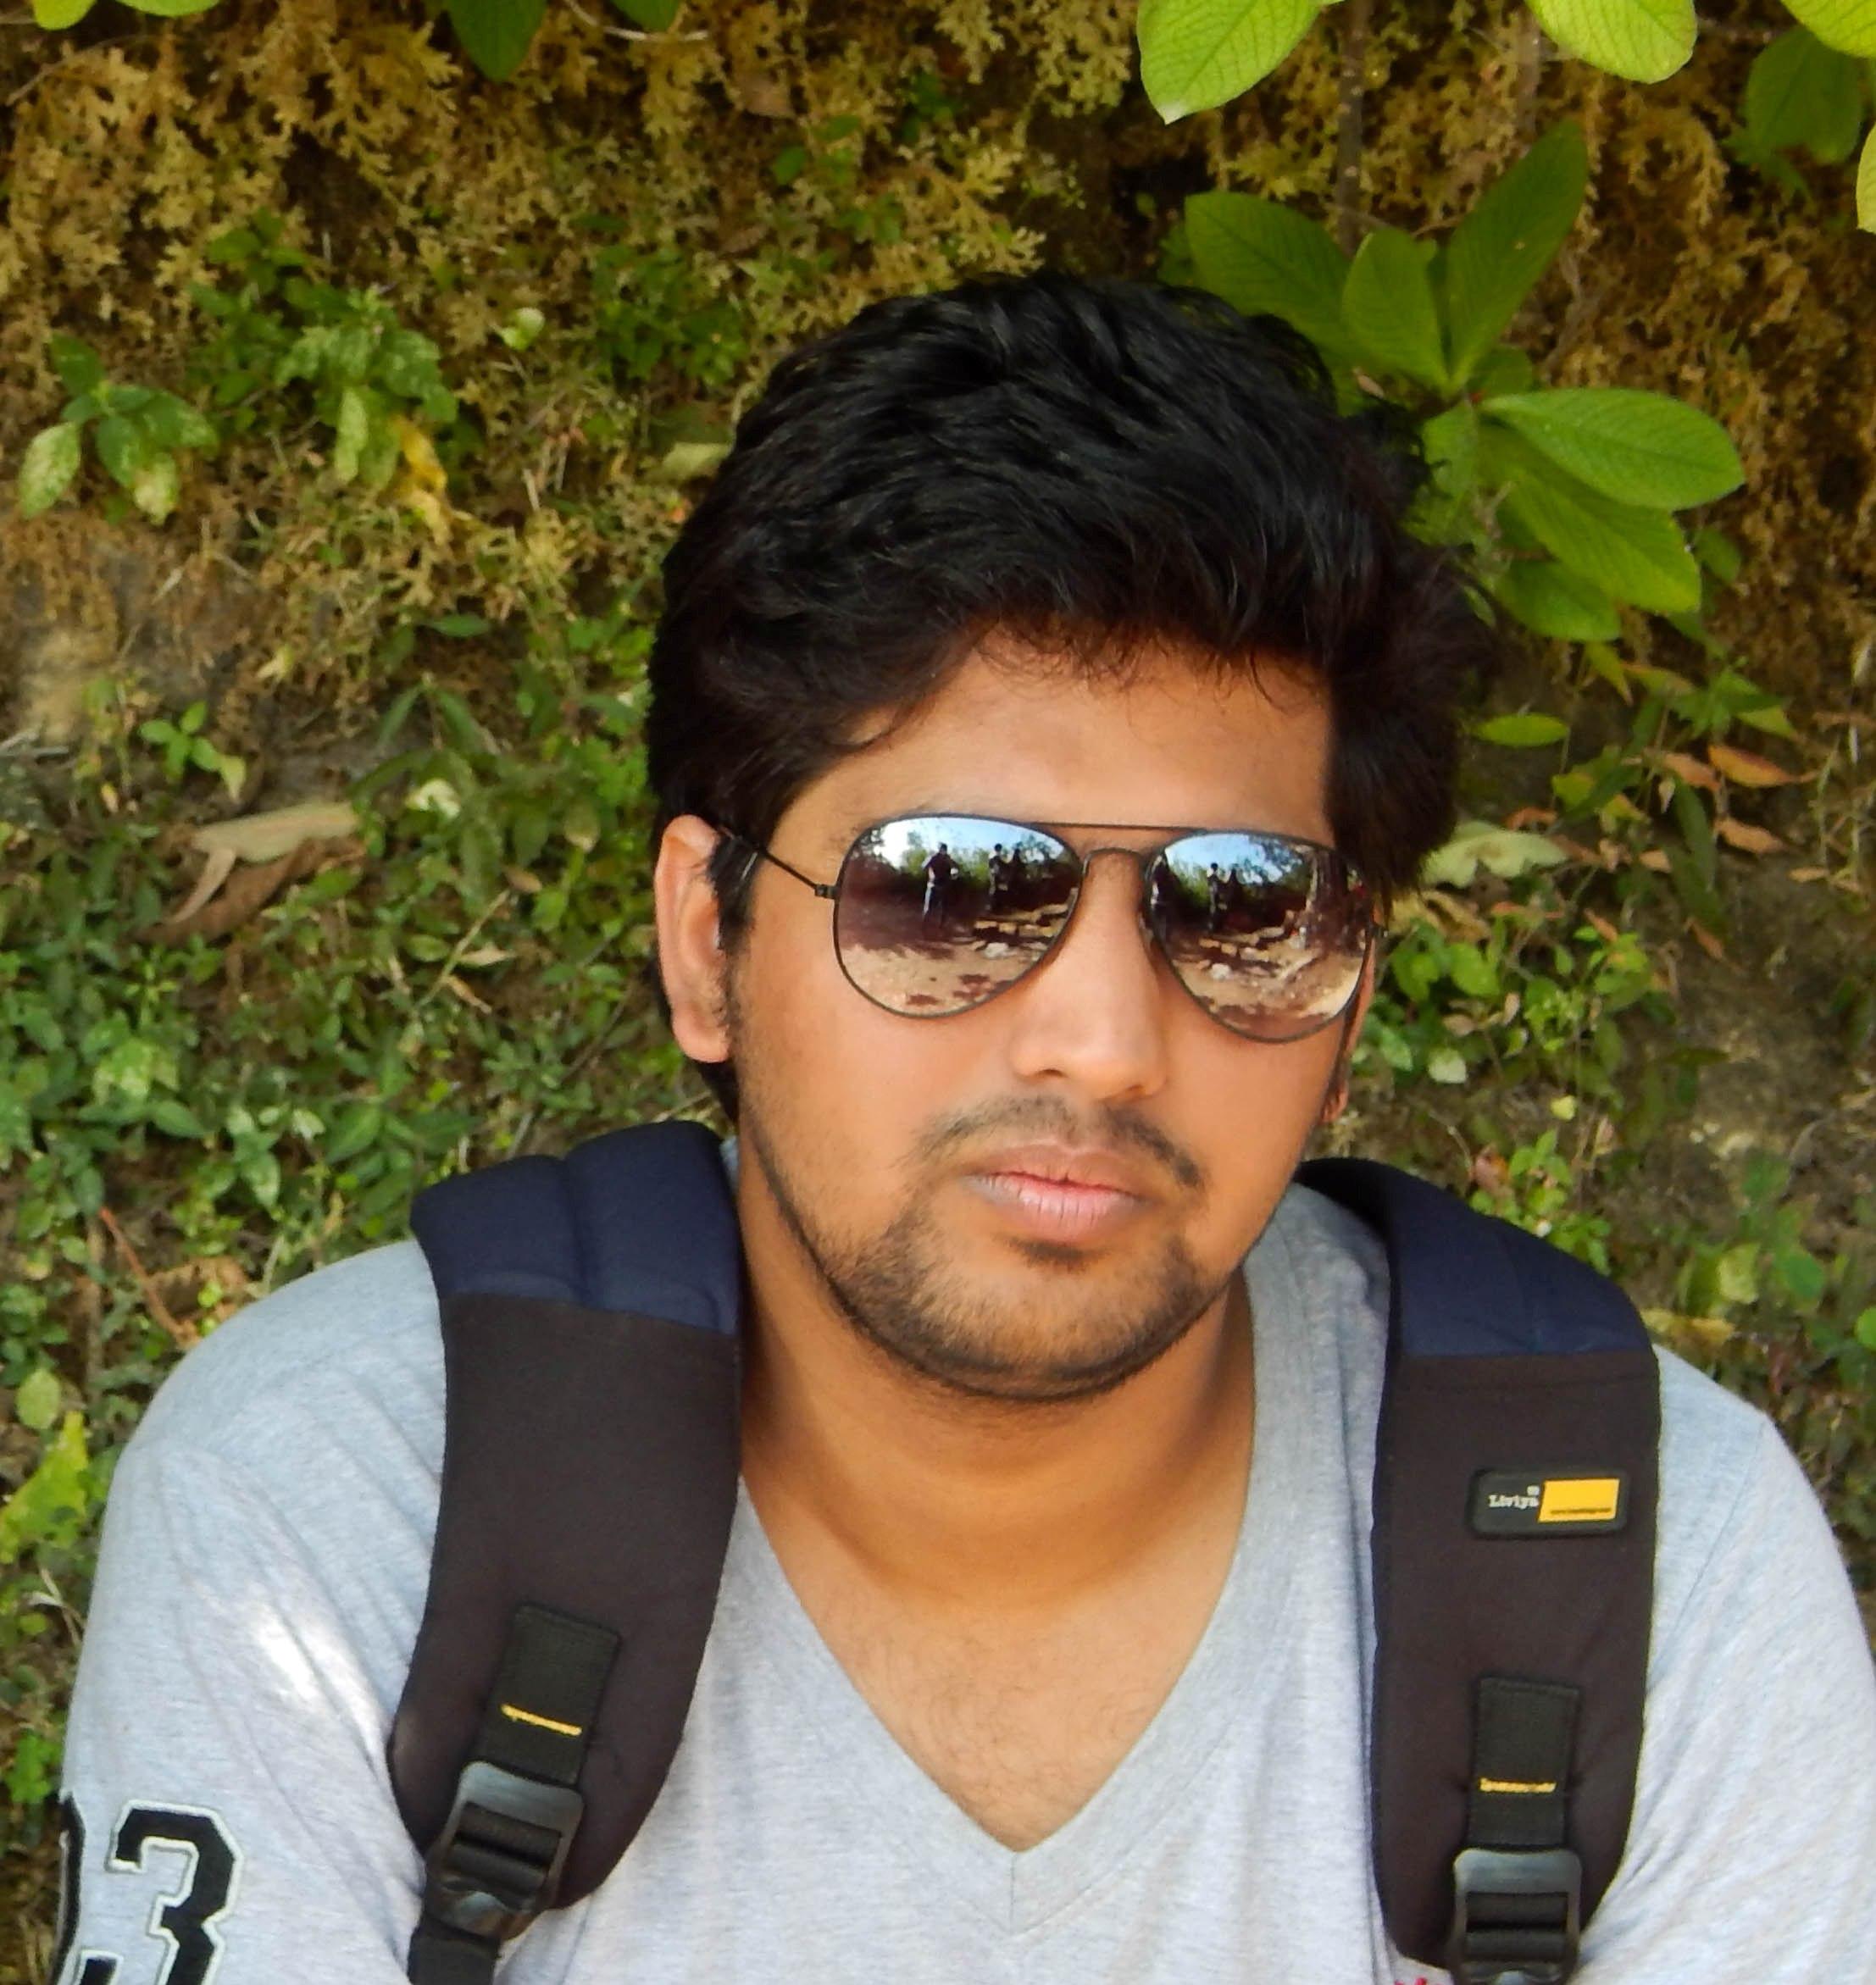 public-health-internship-at-foundation-of-healthcare-technologies-society-new-delhi-story-of-bikash-gyawali